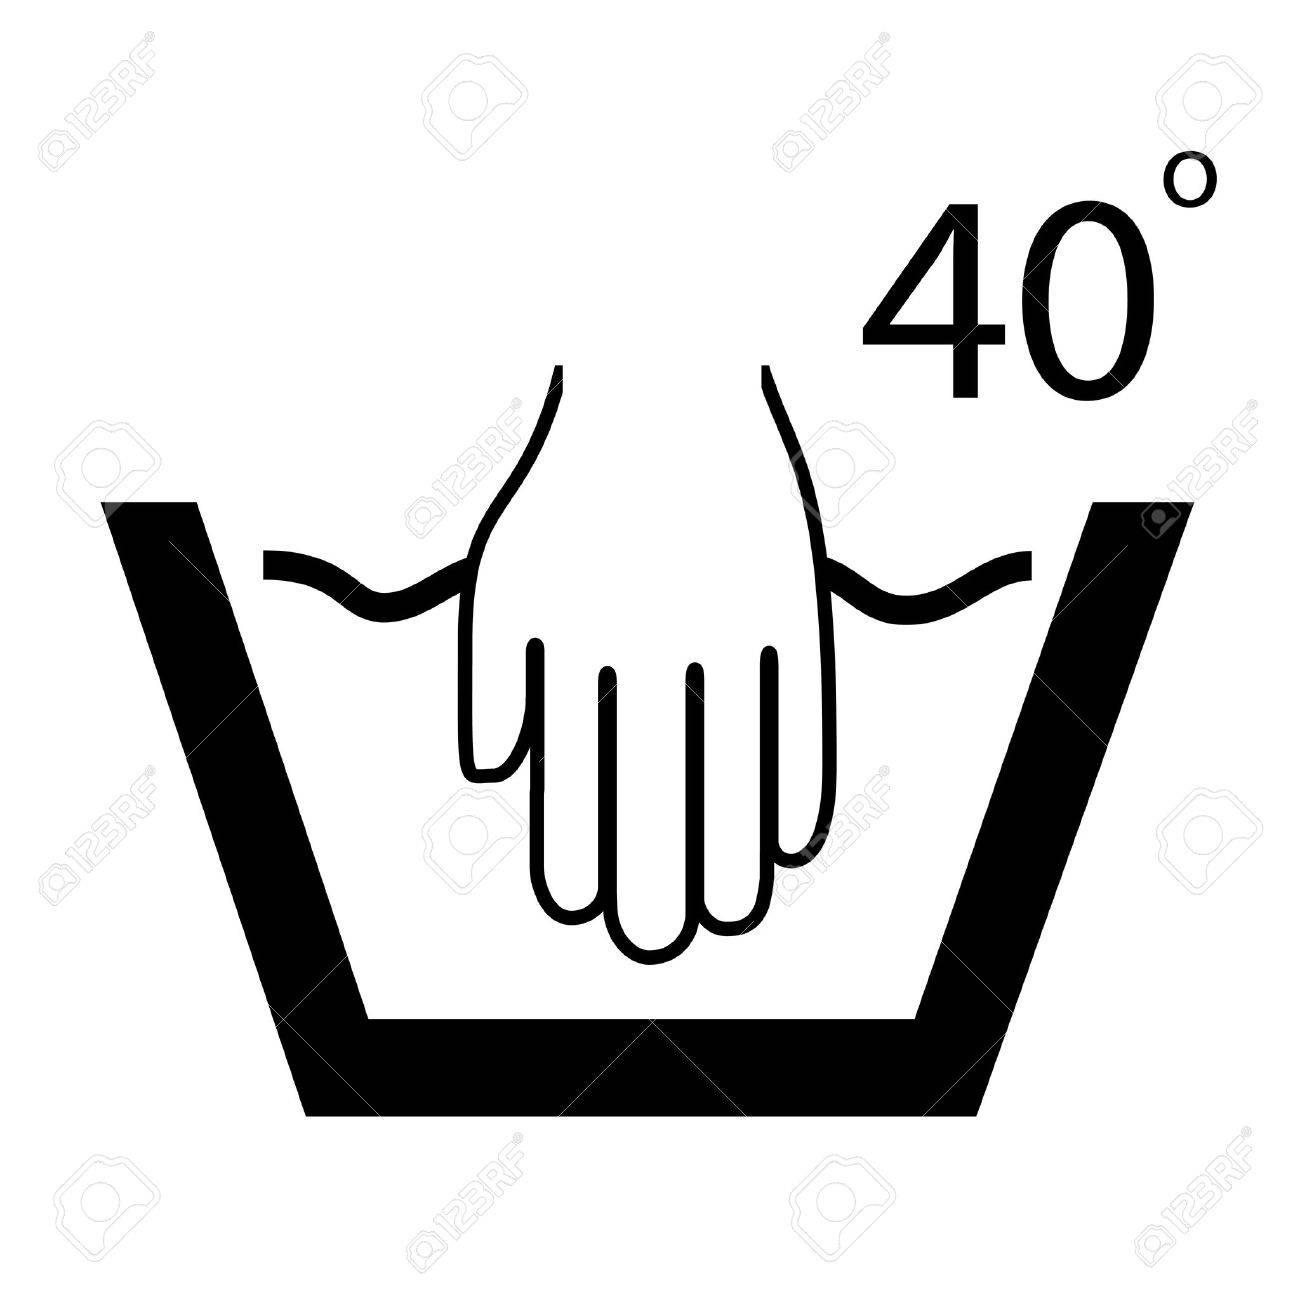 Hand wash symbol royalty free cliparts vectors and stock hand wash symbol stock vector 21936808 buycottarizona Image collections